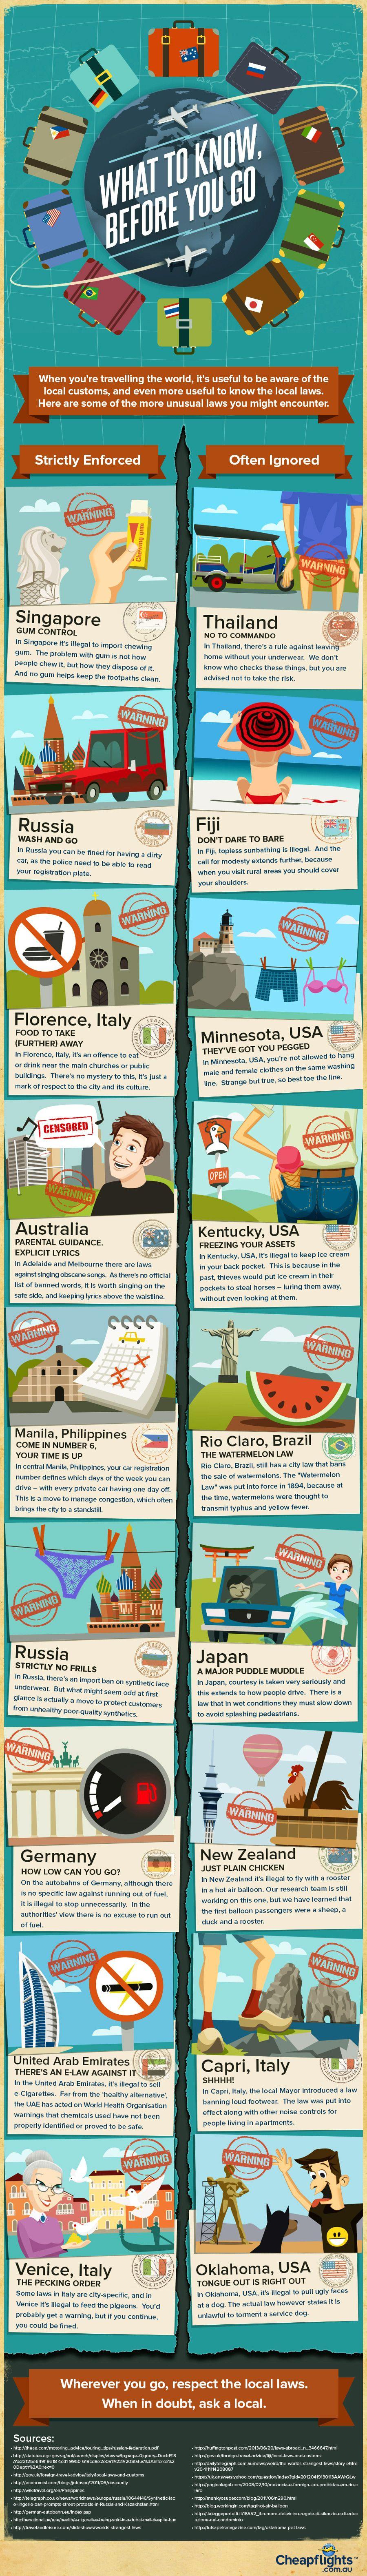 Strange Laws Around the World